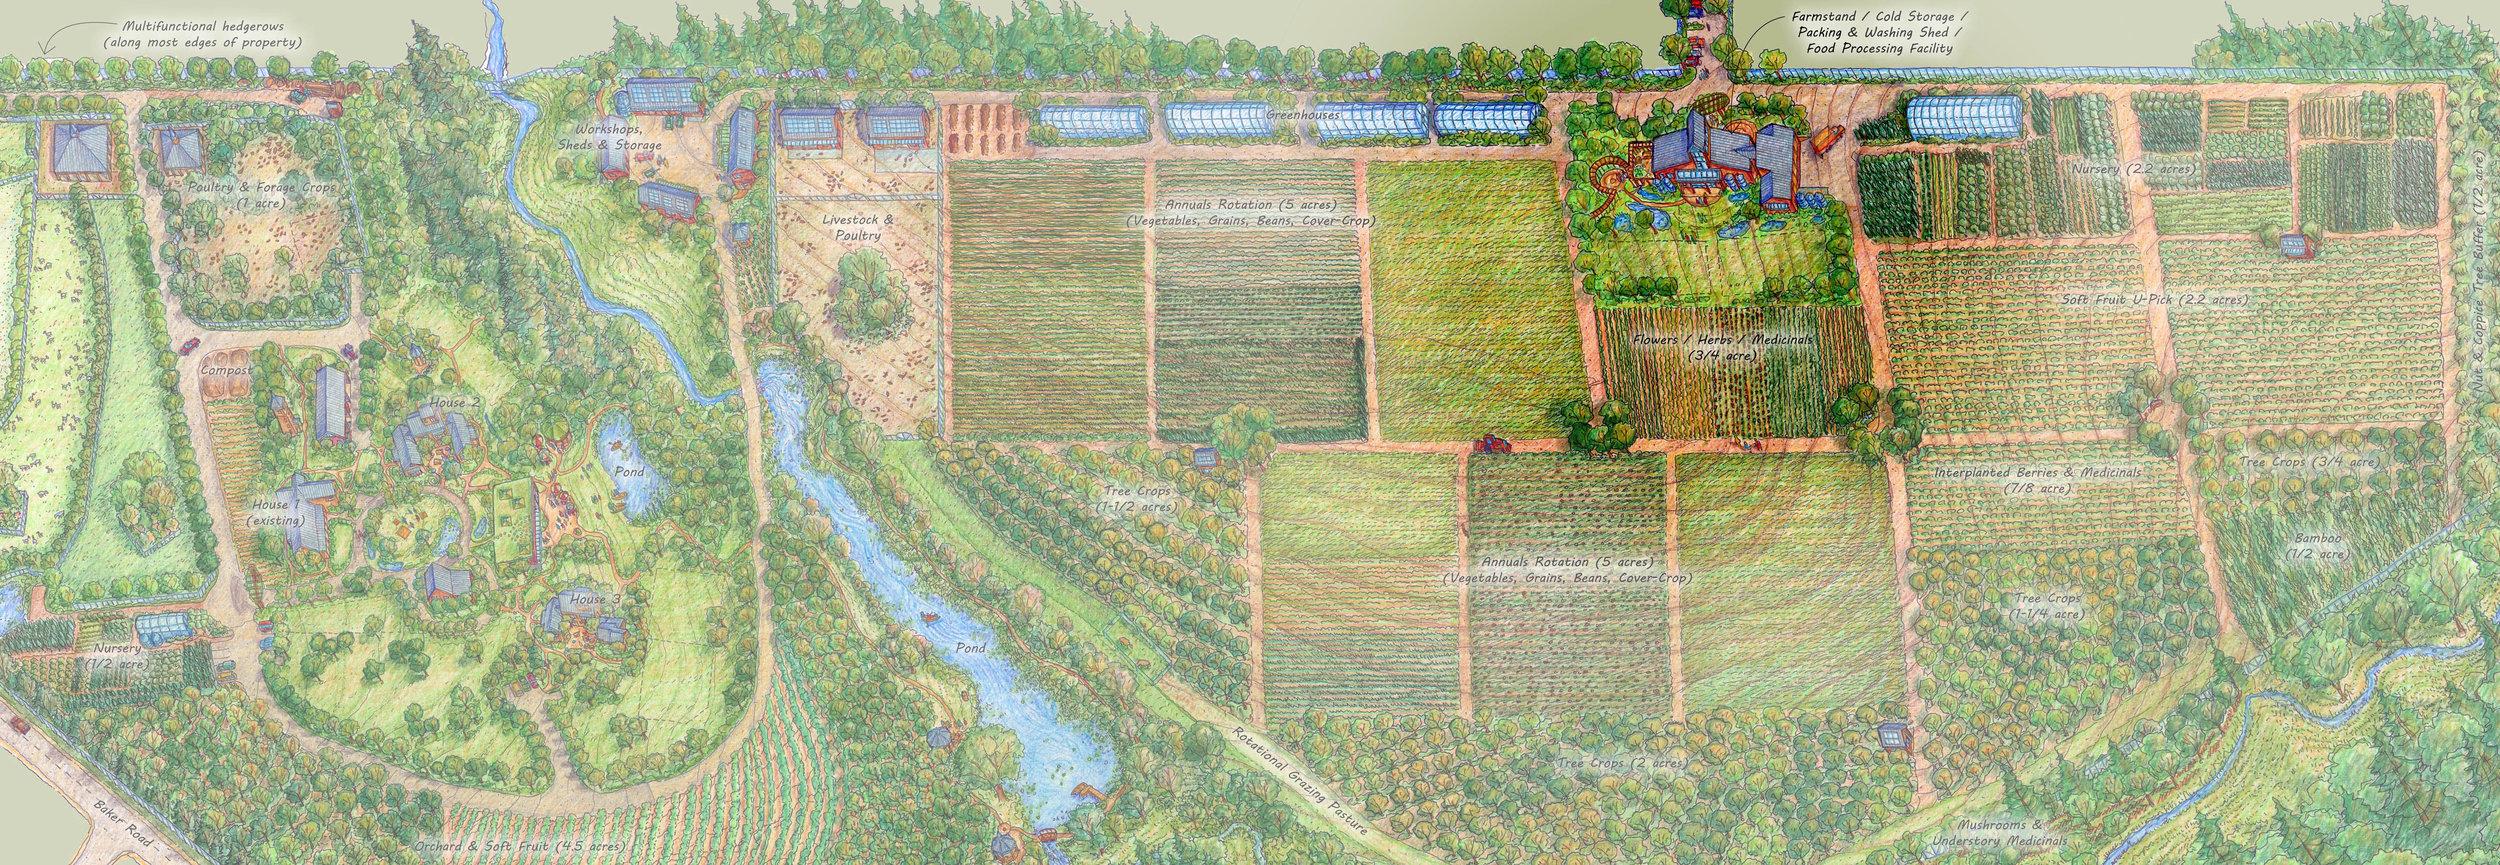 Harka Architecture_CSA Farmstand_Our Table. (2).jpg